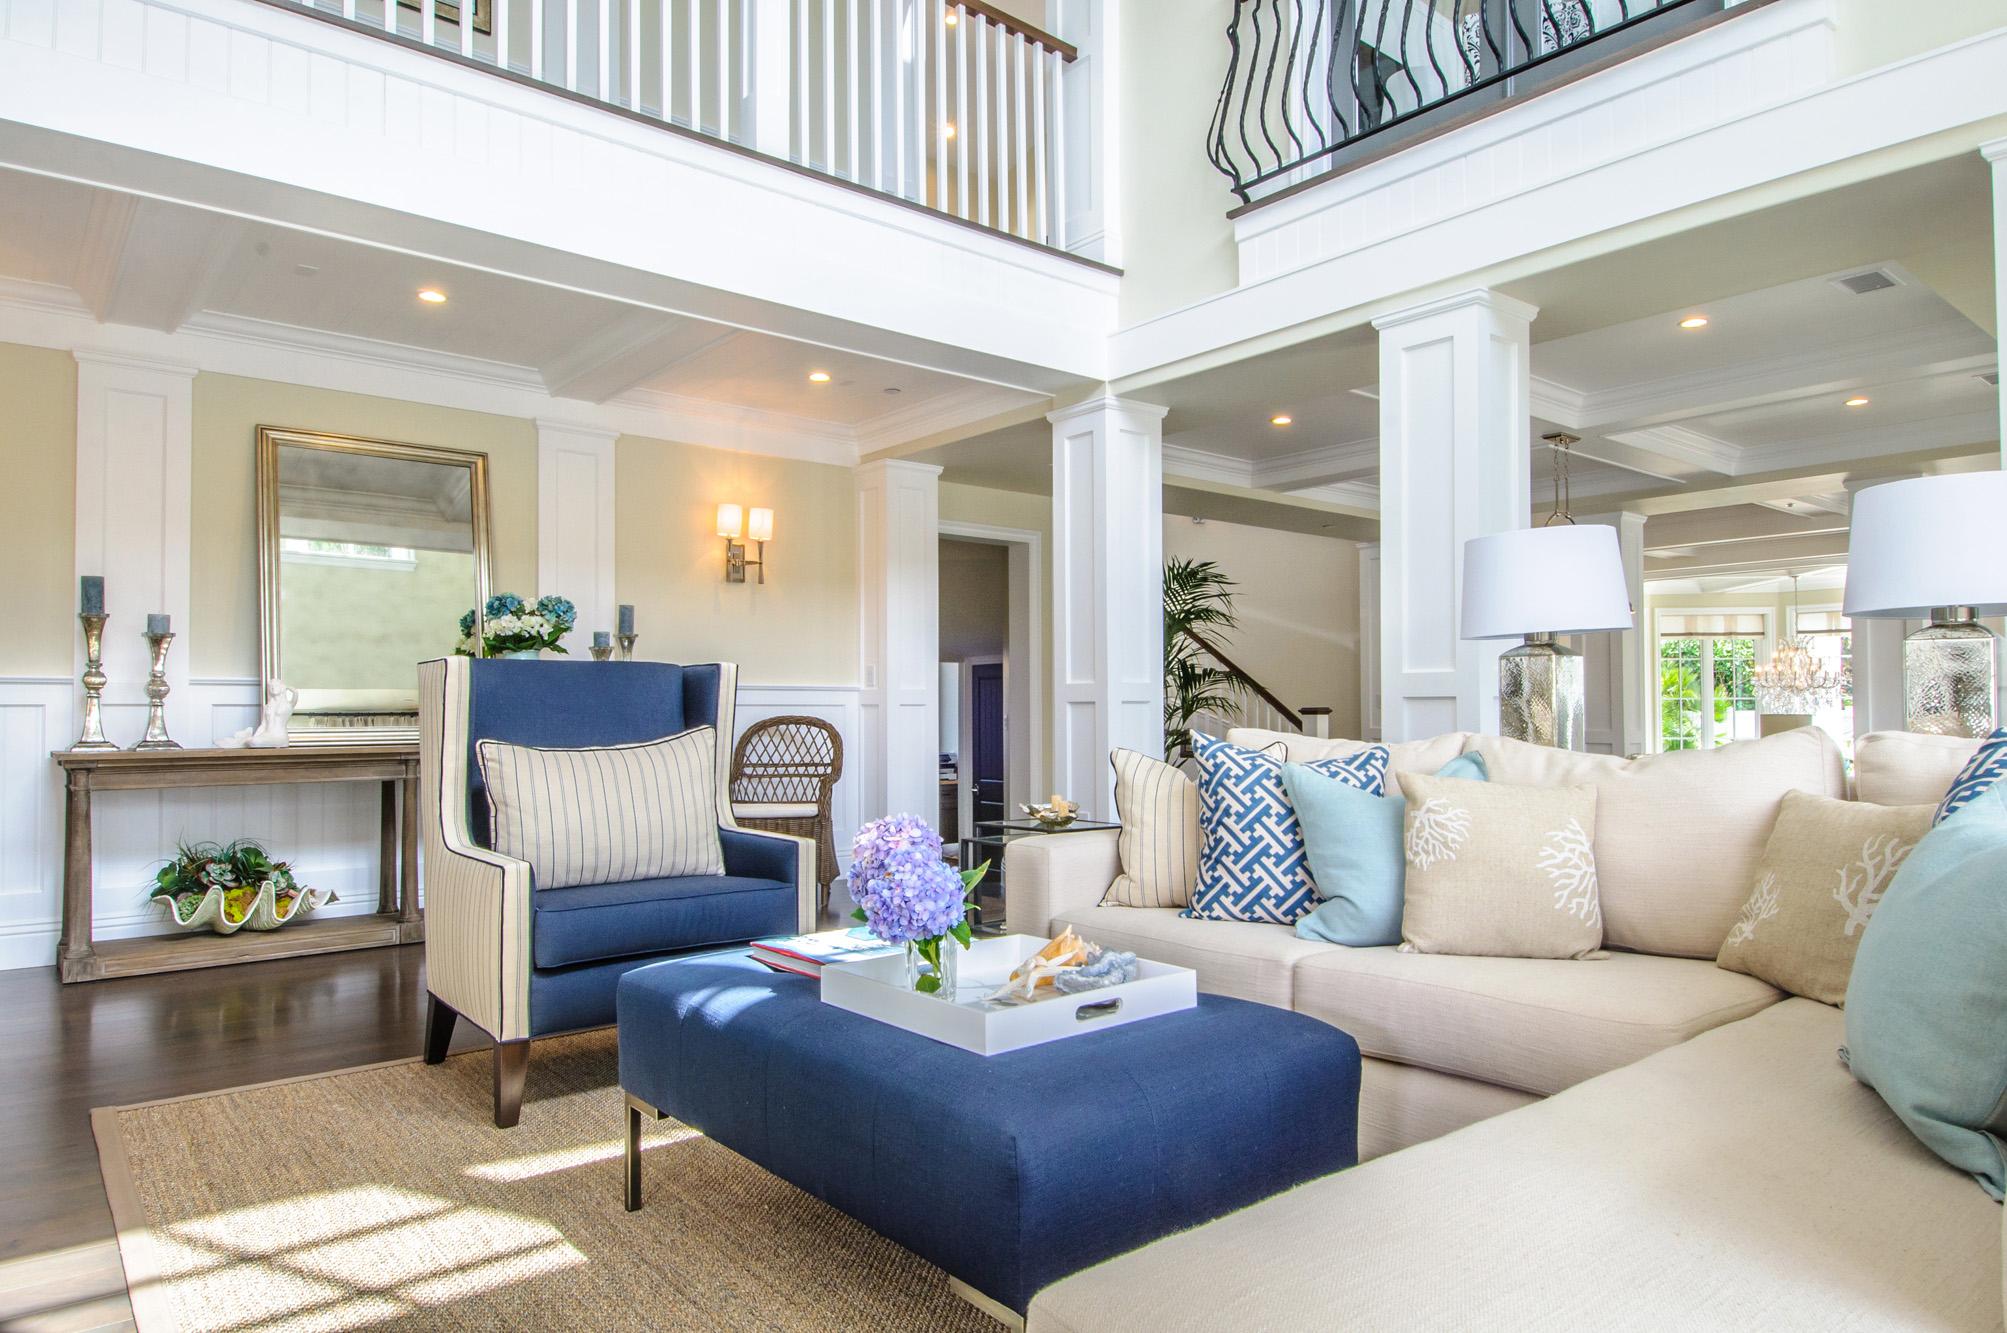 capecod living room - navy ottoman.jpg